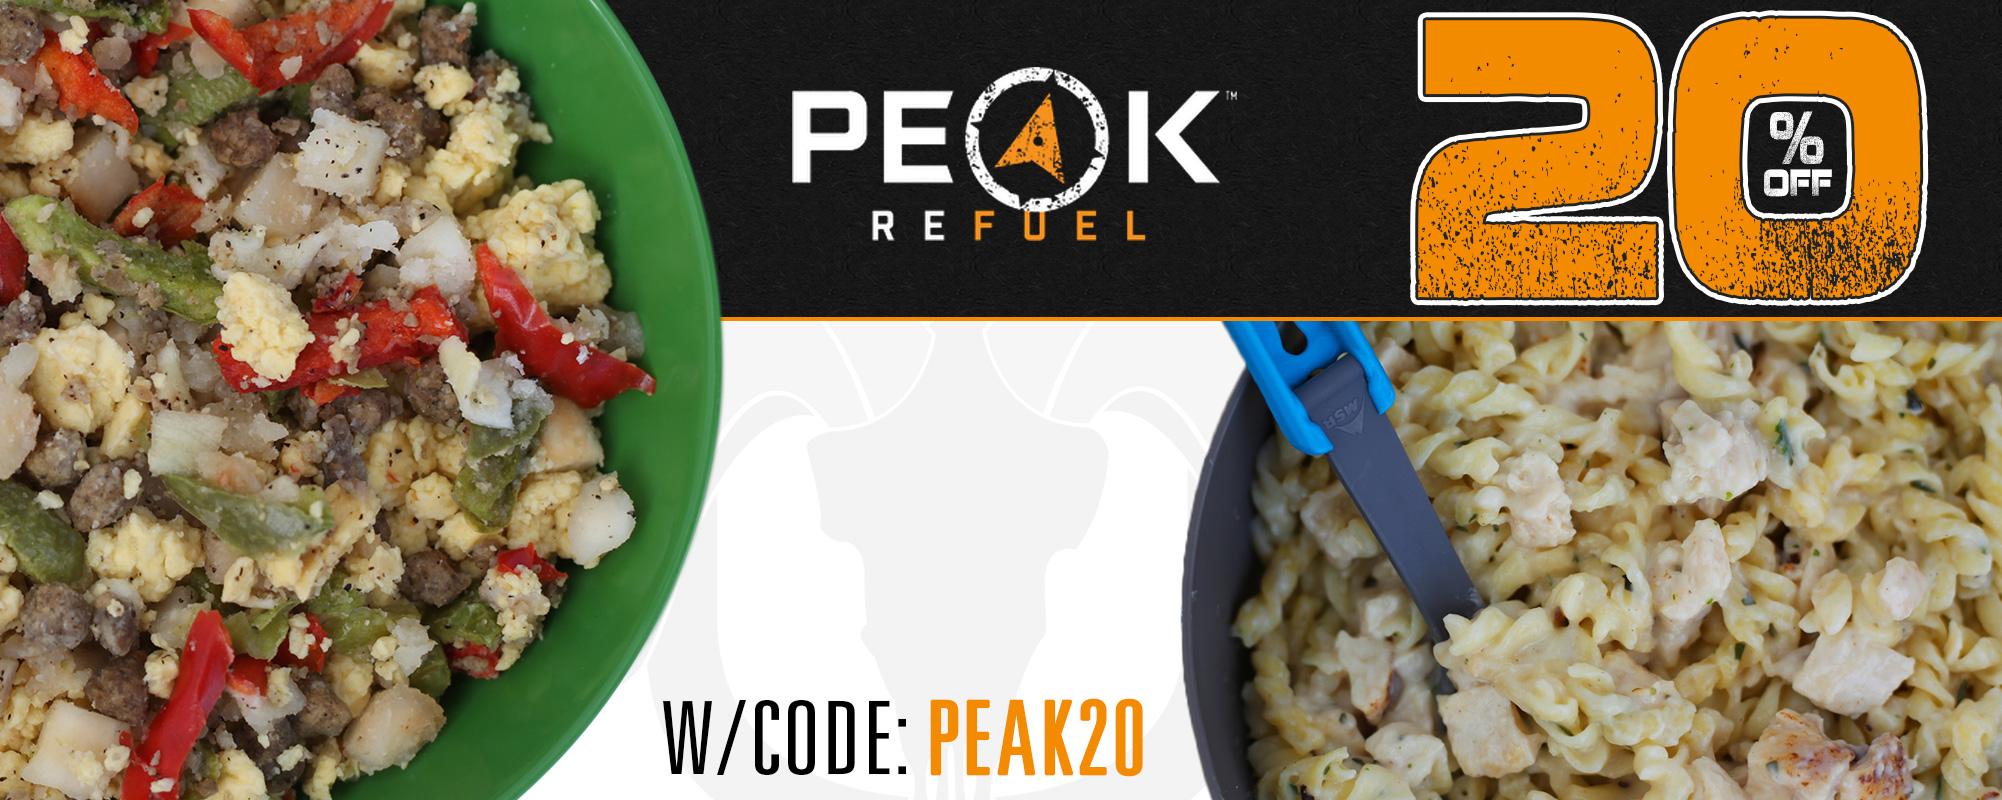 Peak Refuel Sale